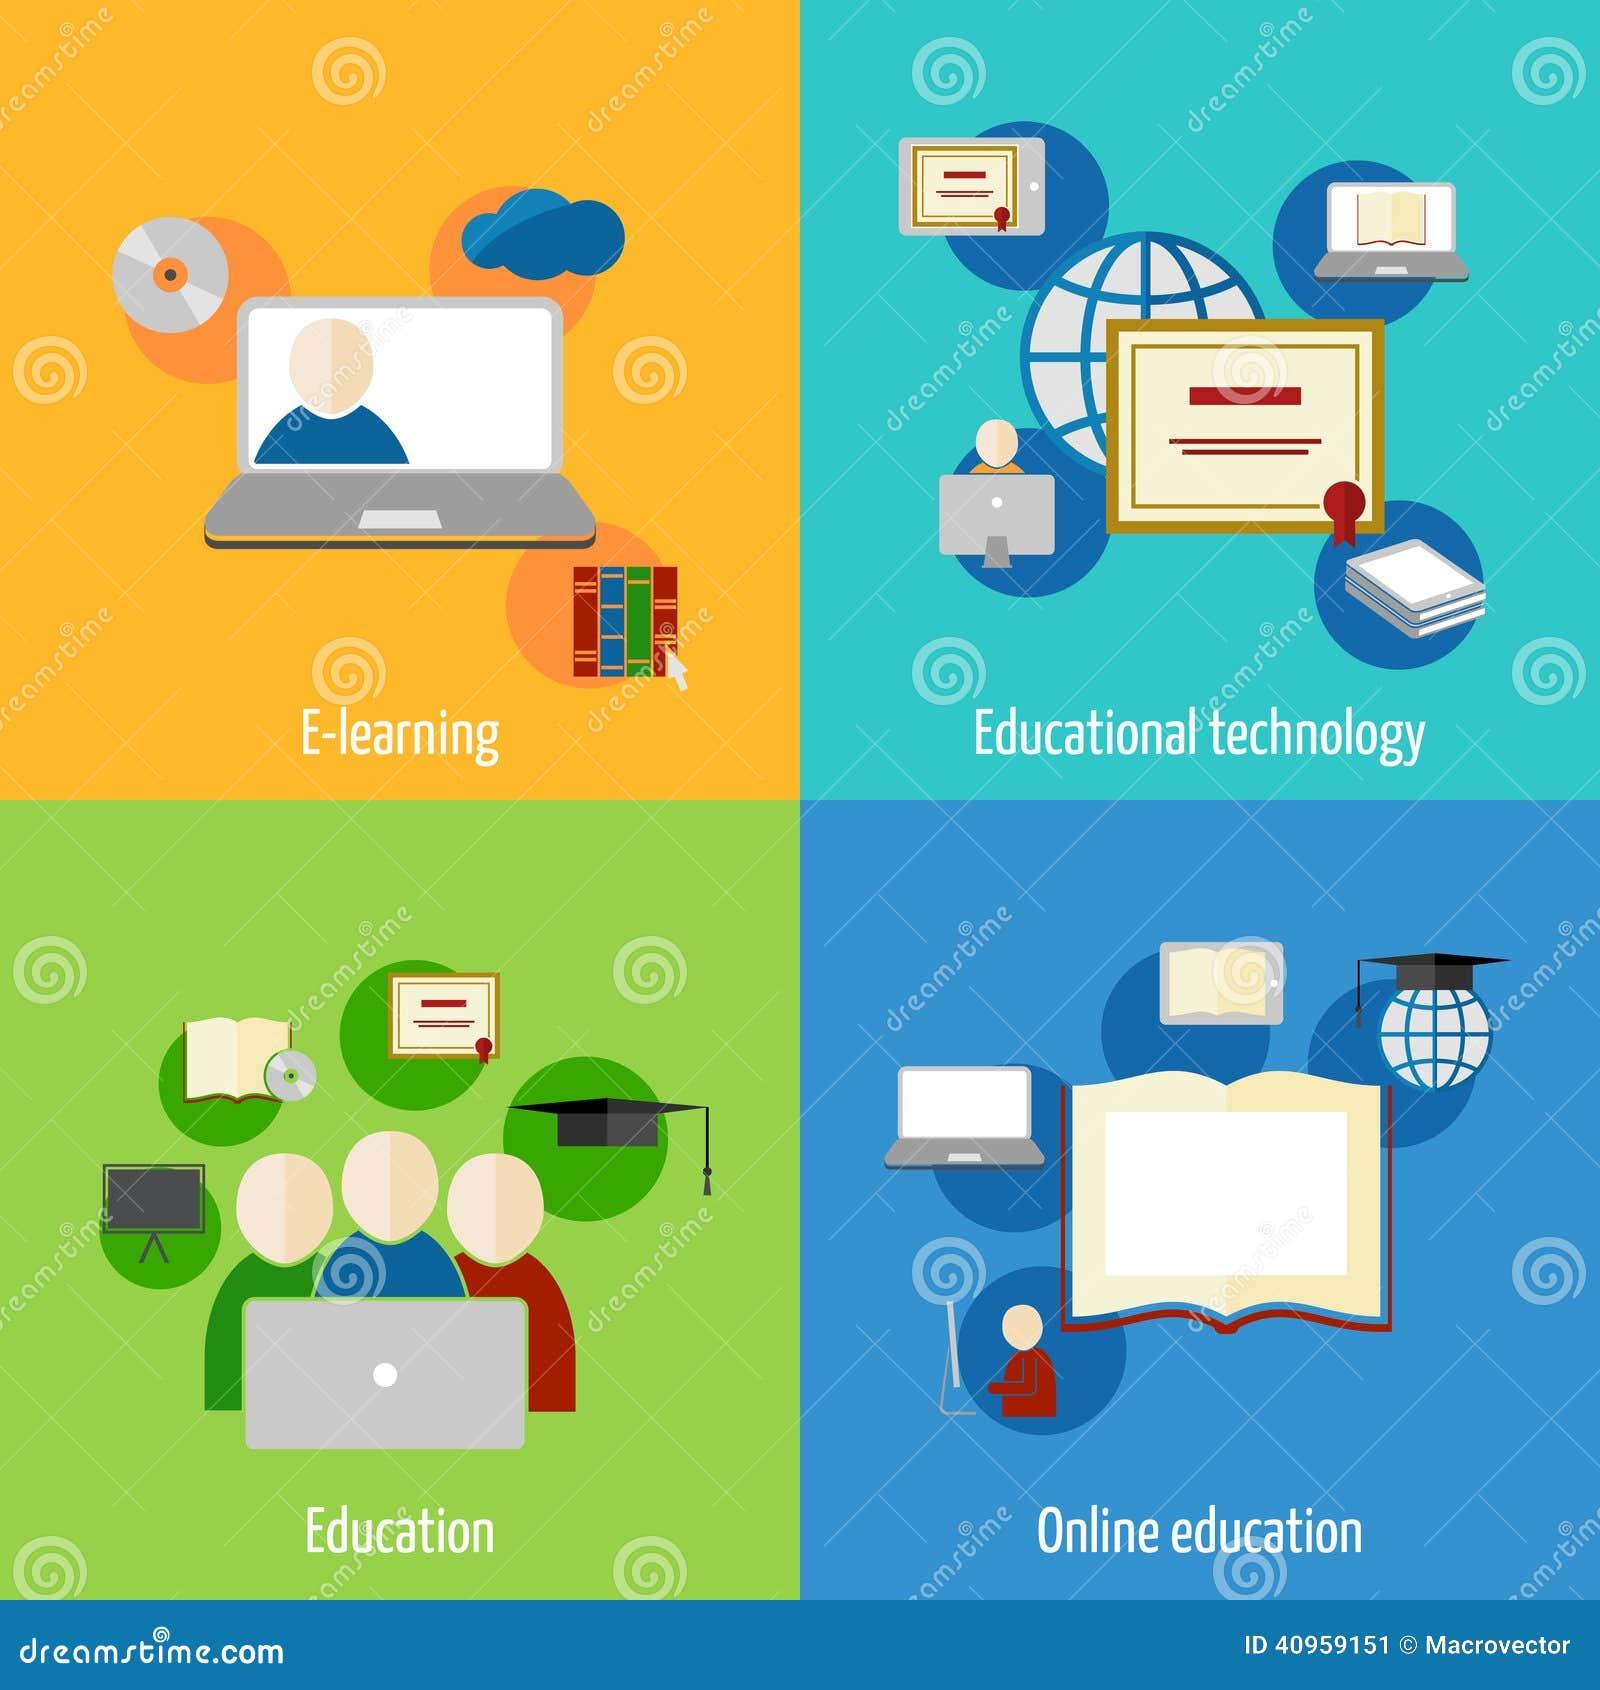 Study & Create Online Flashcards - ProProfs Flashcard Maker